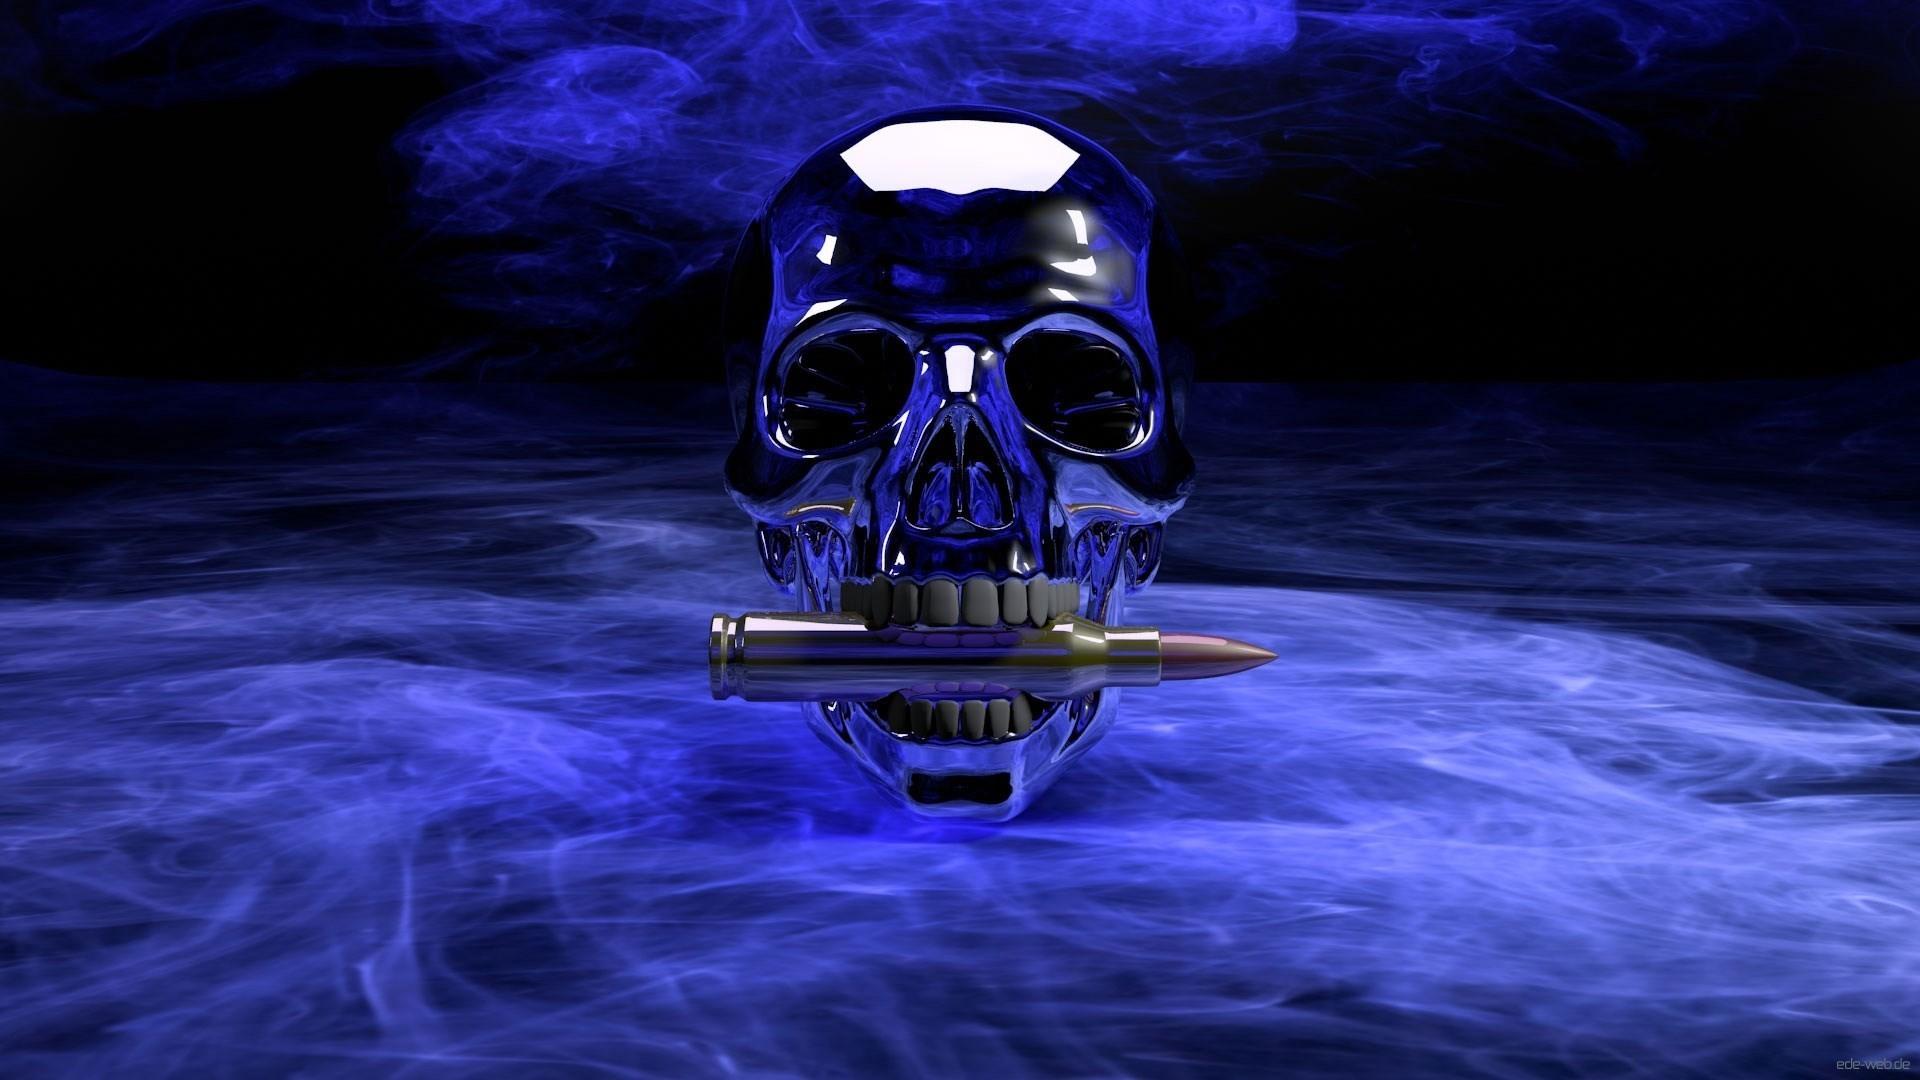 Skull 3d Wallpaper: Skull Wallpapers For Desktop ·①